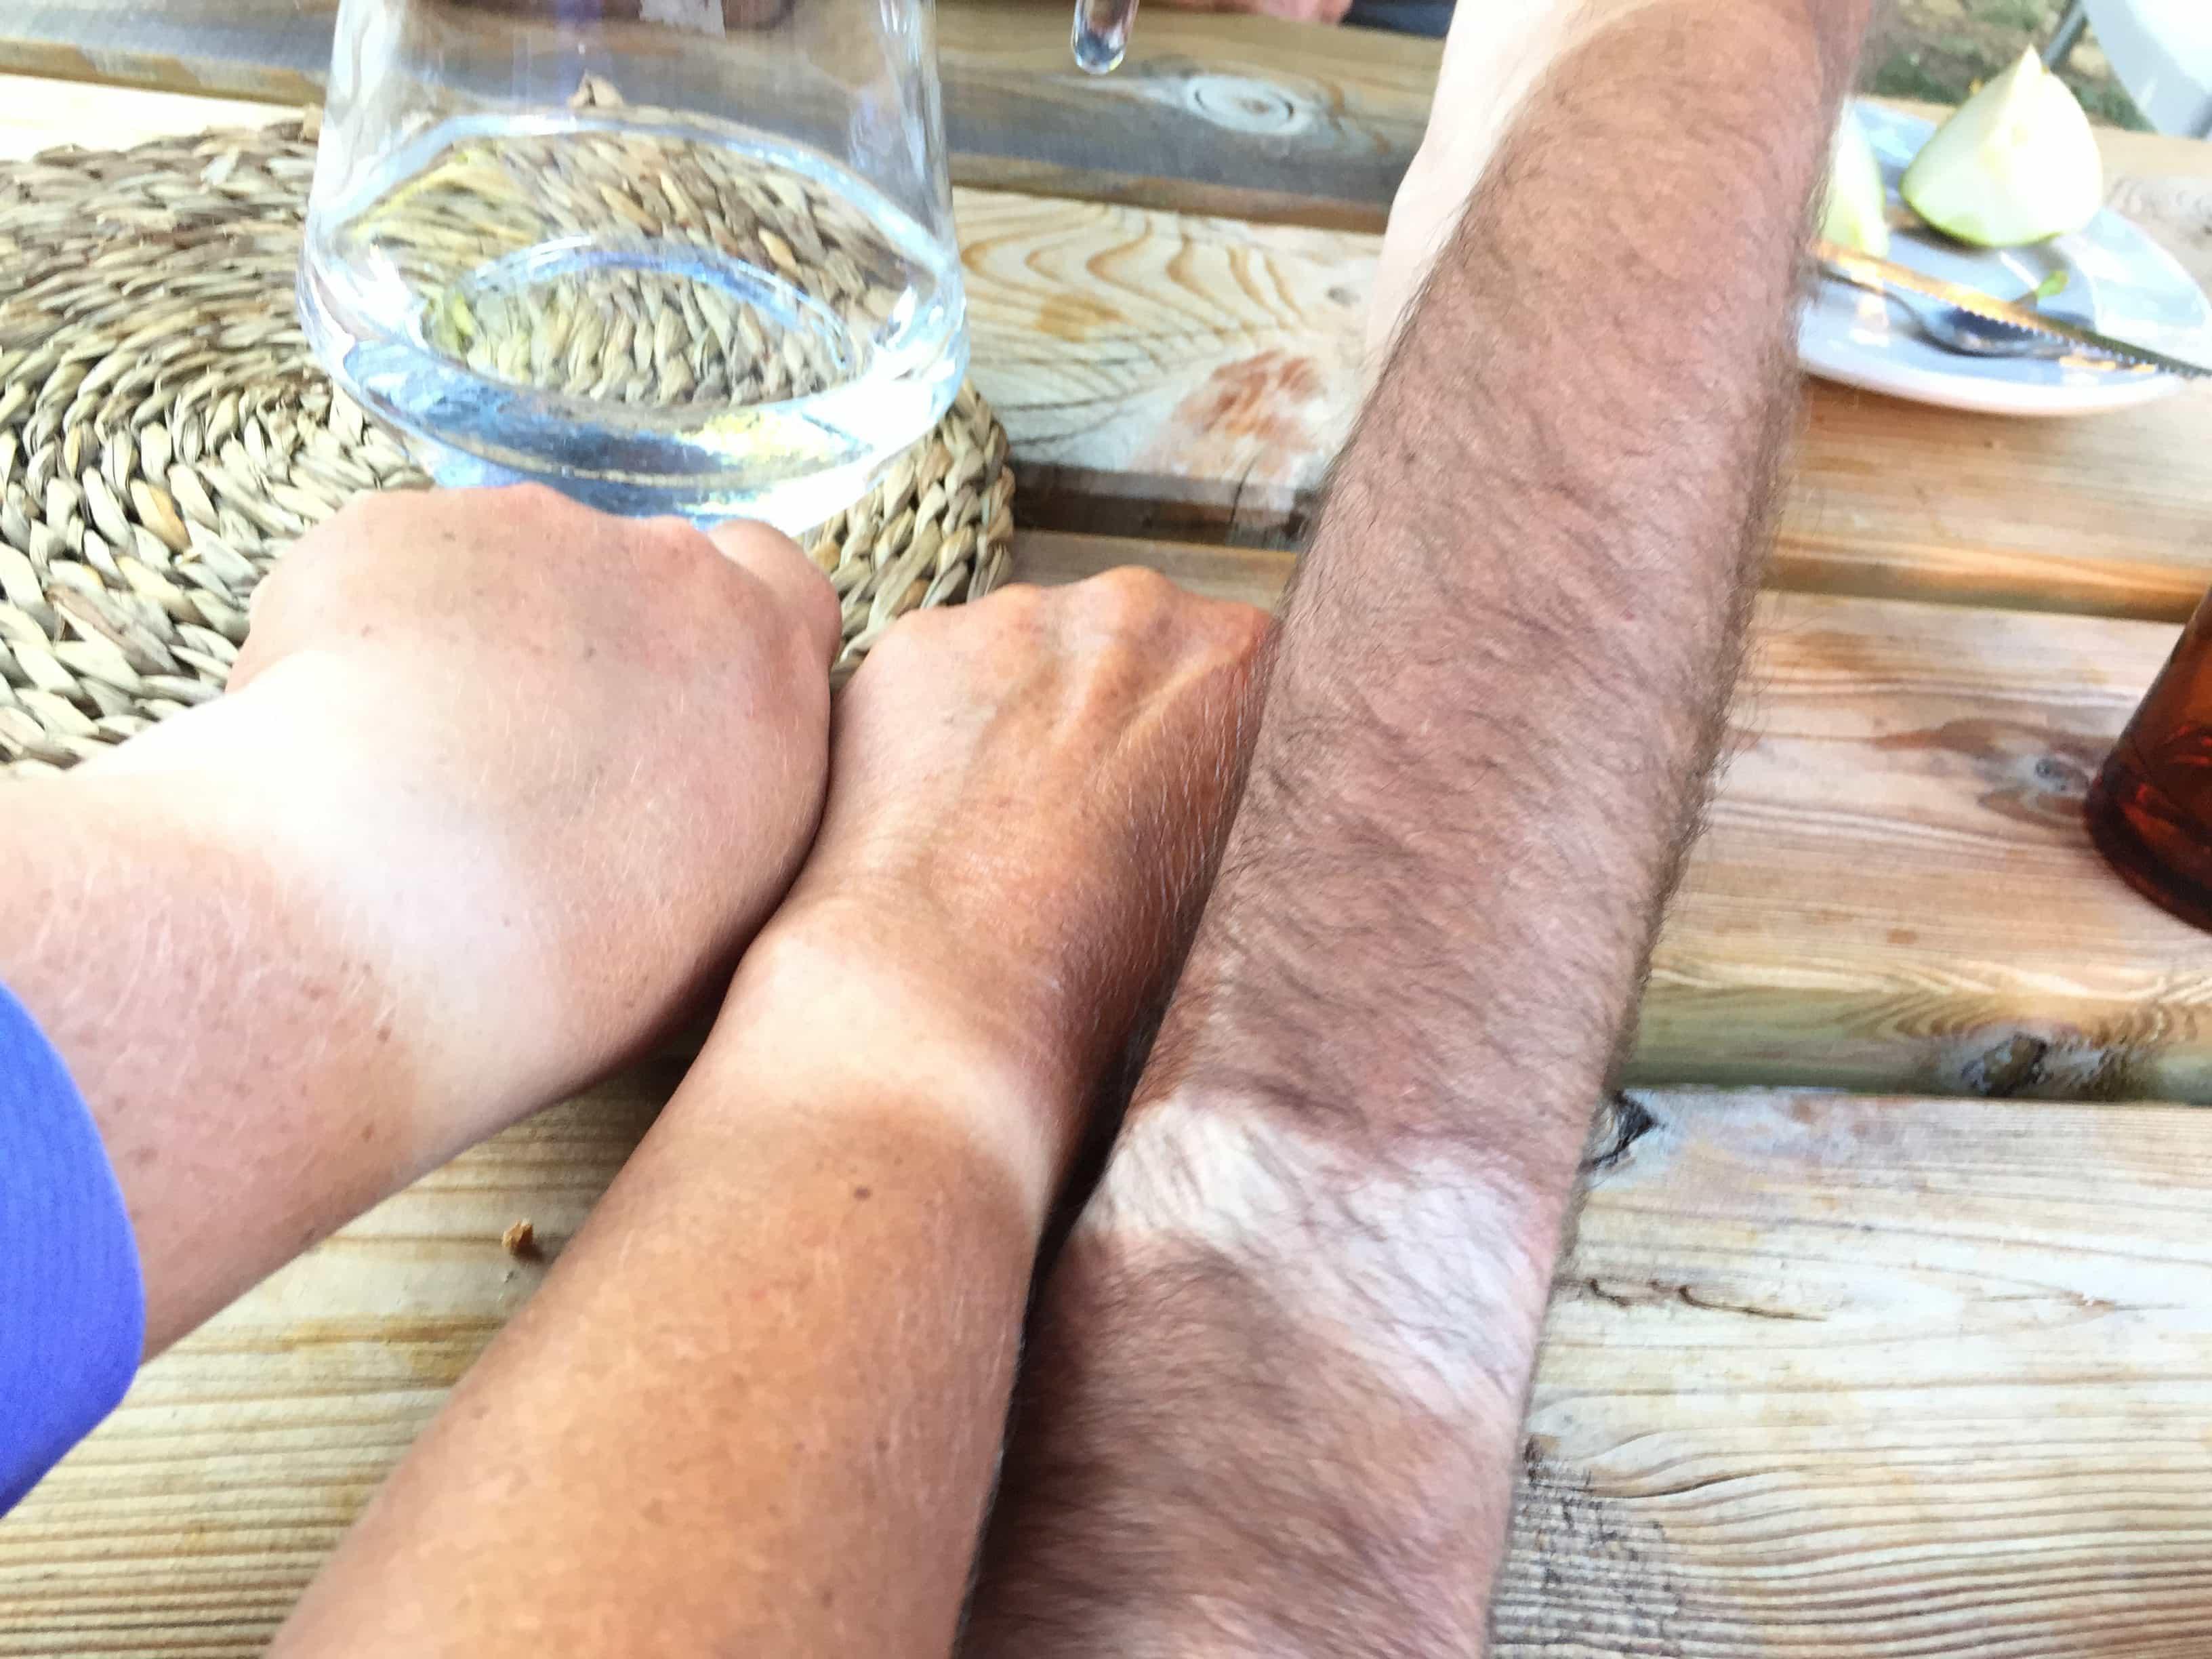 Comparing tan lines